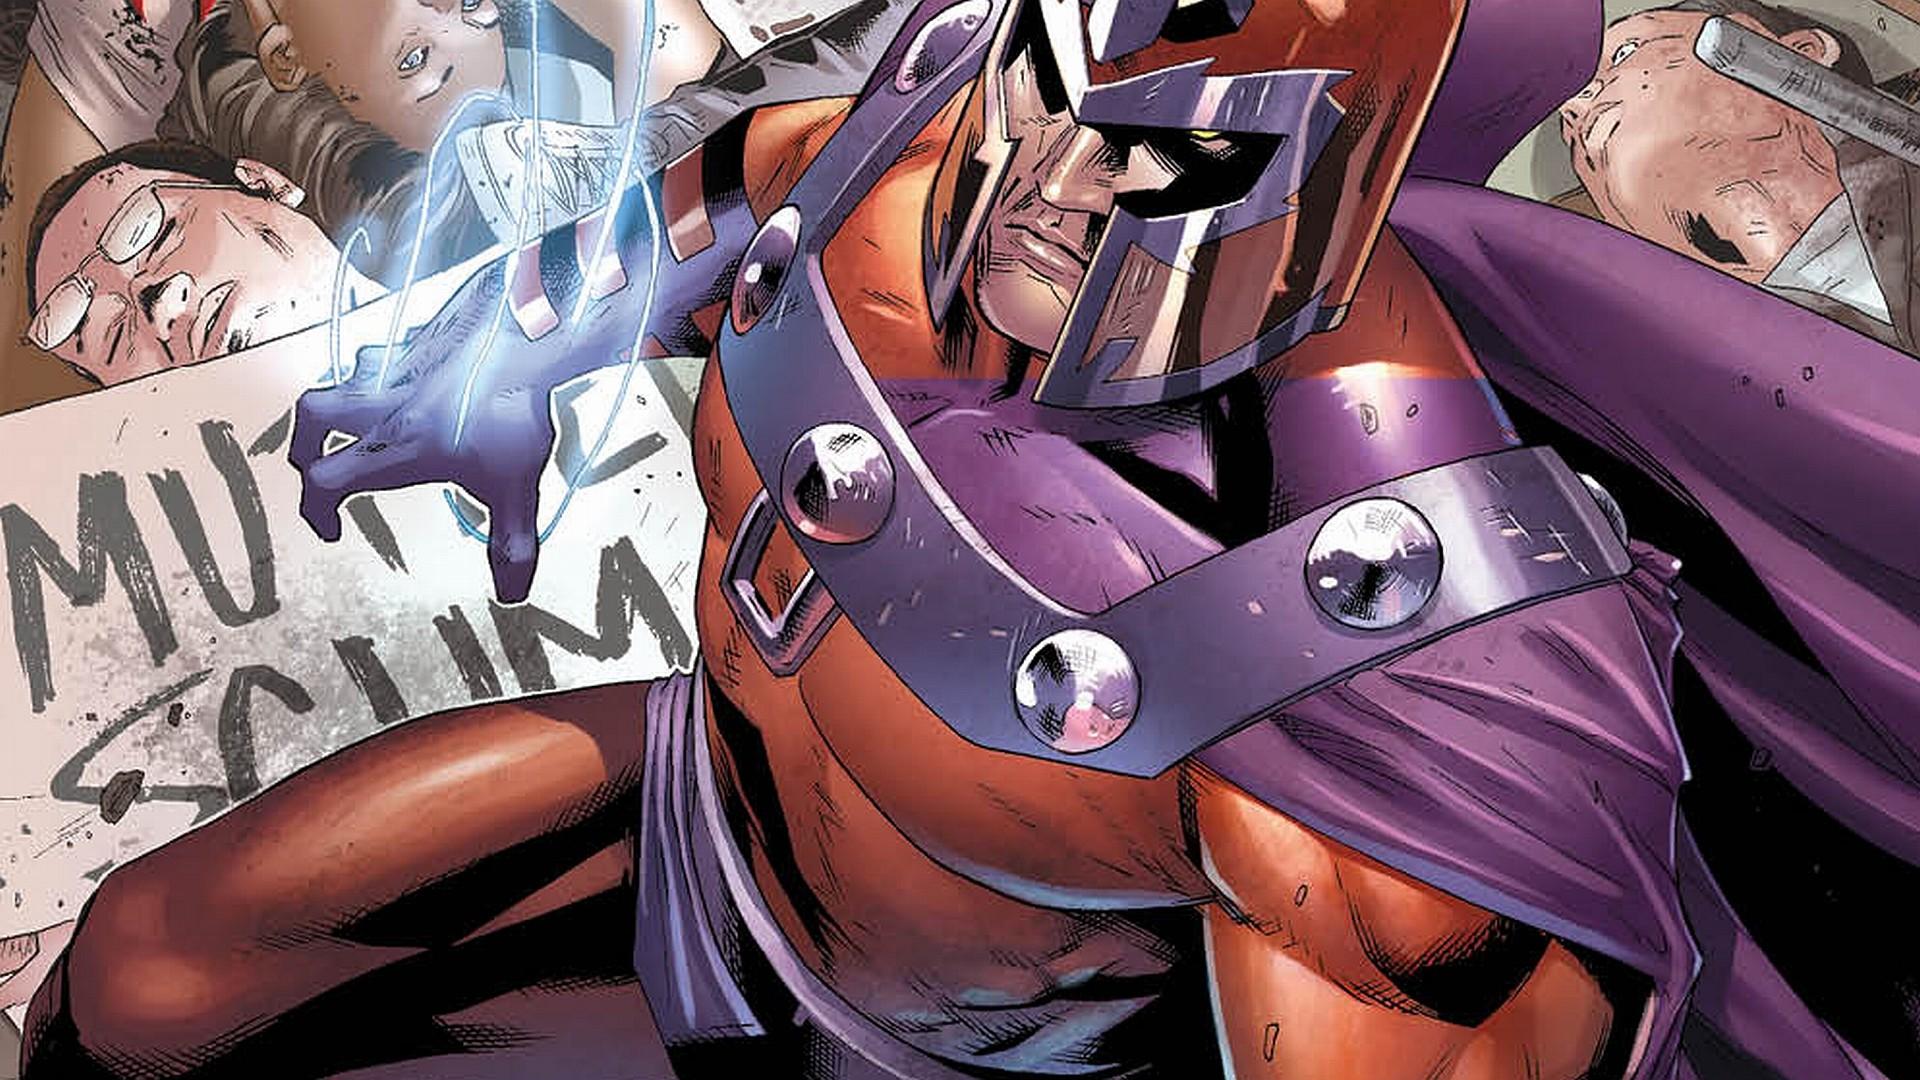 1920x1080 Magneto Wallpaper Background 20160 Full Hd